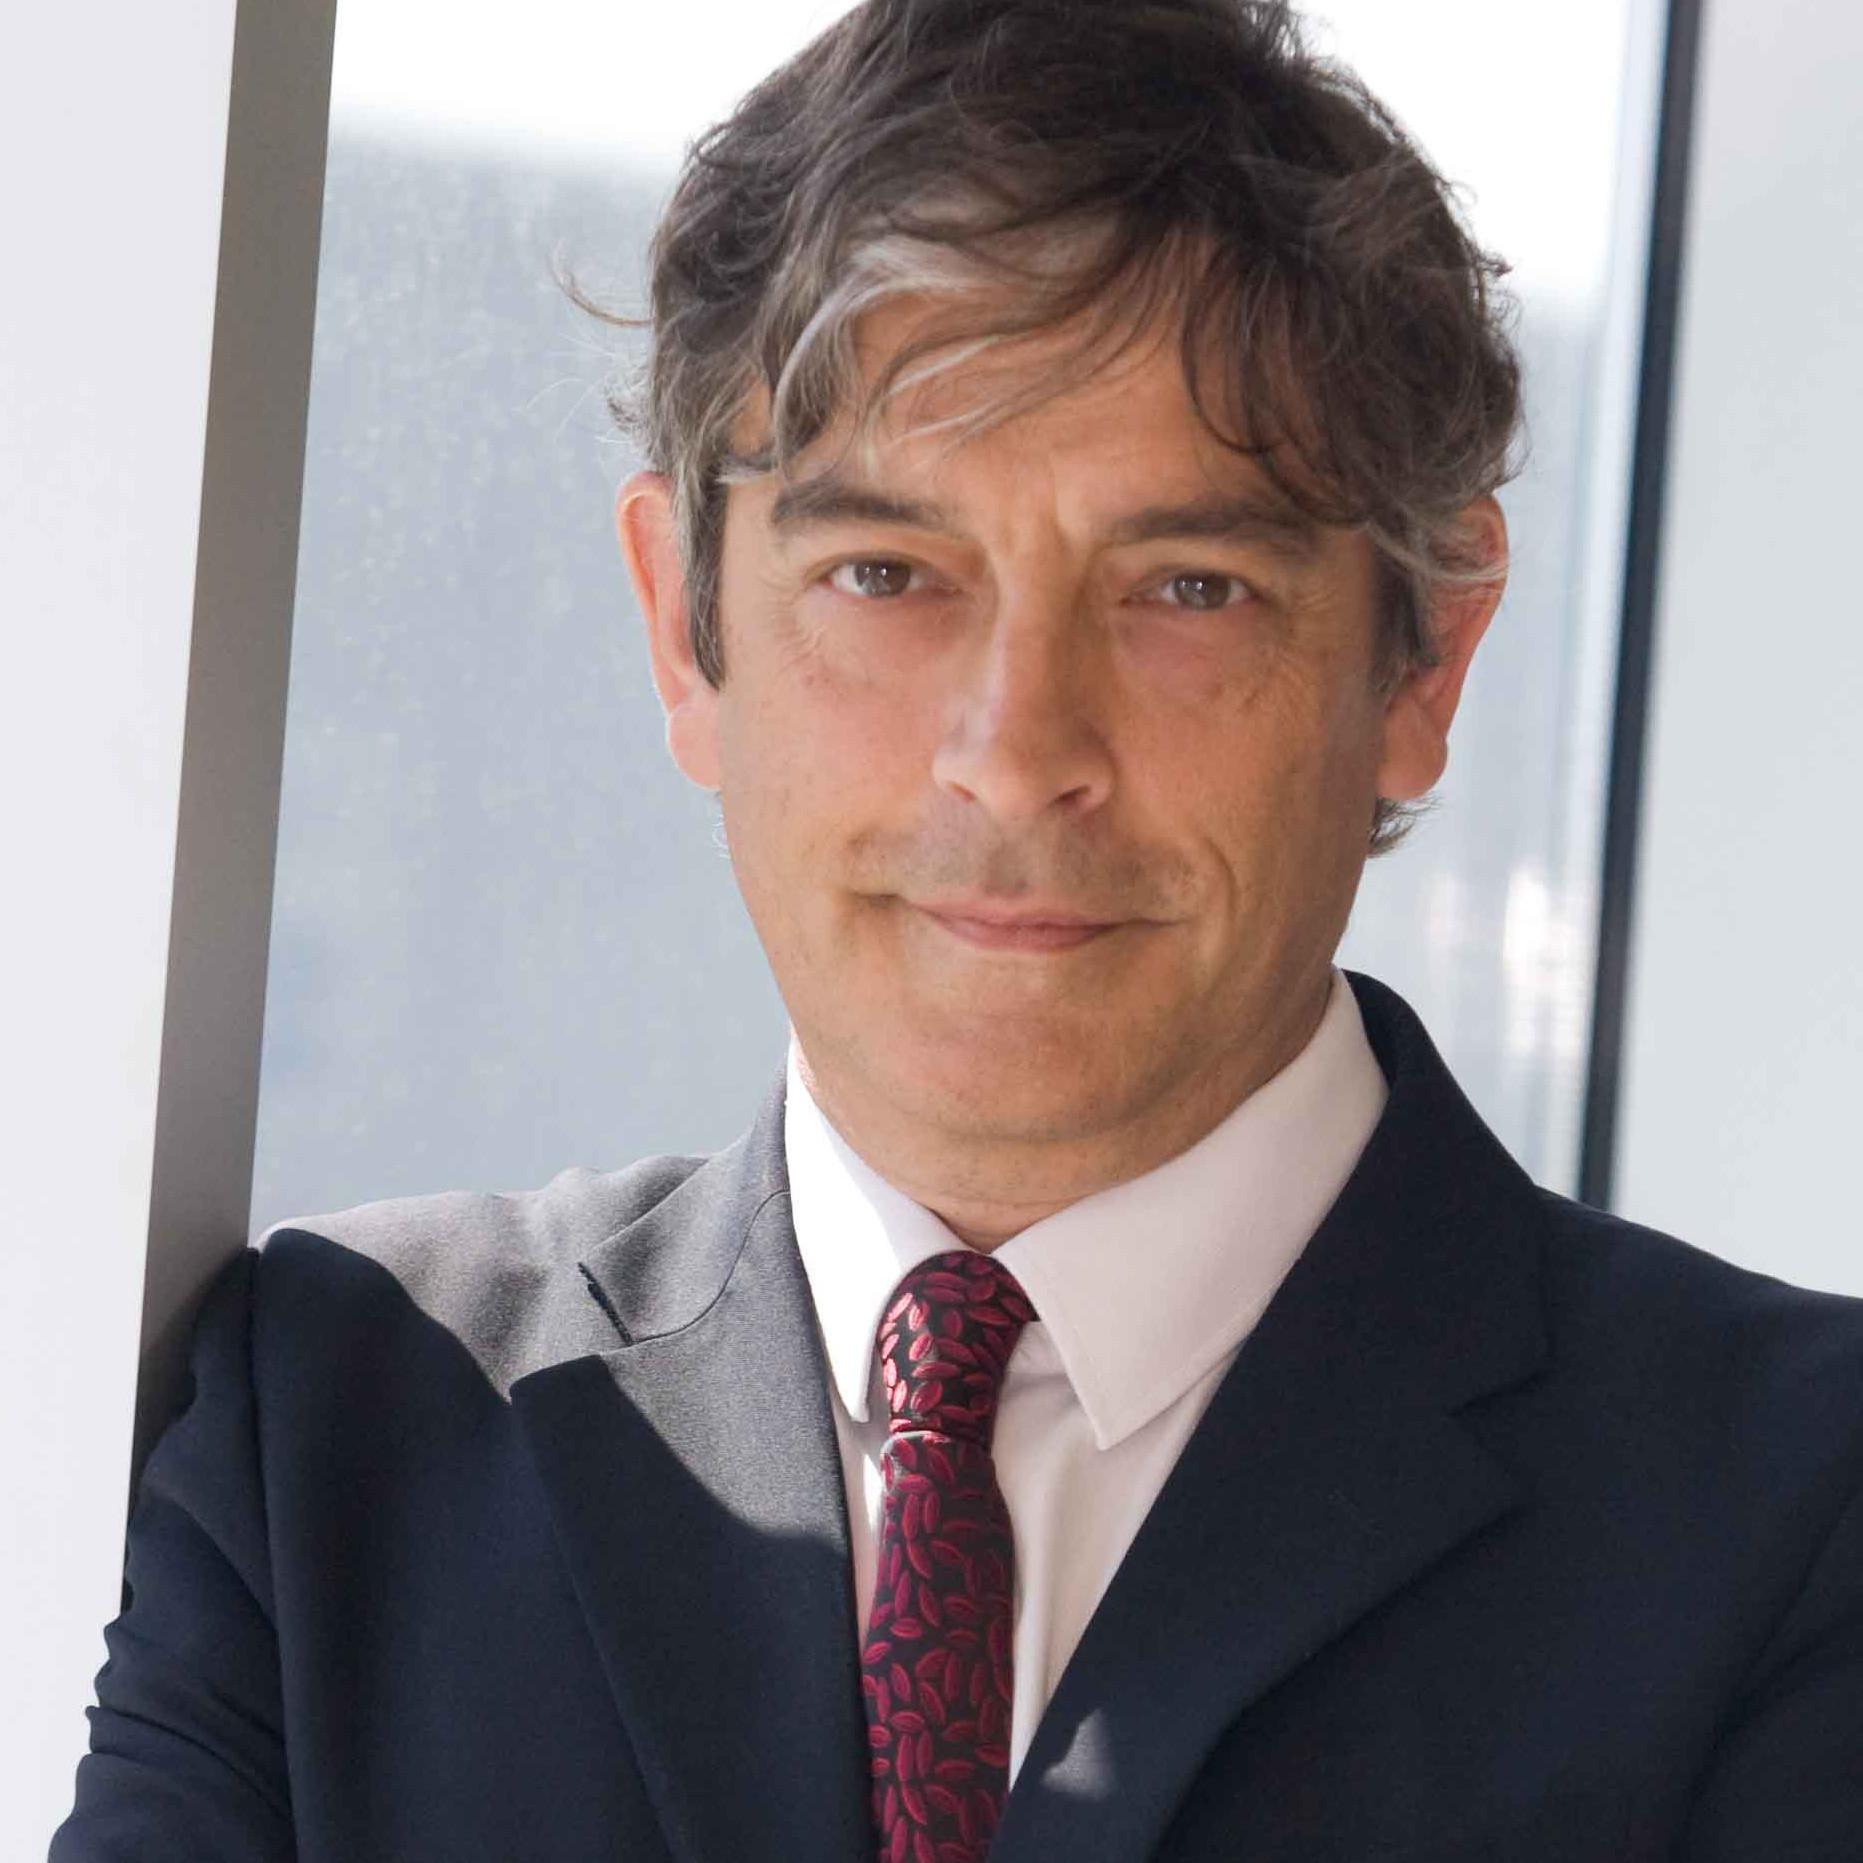 Carlos Buesa, director general d'Oryzon